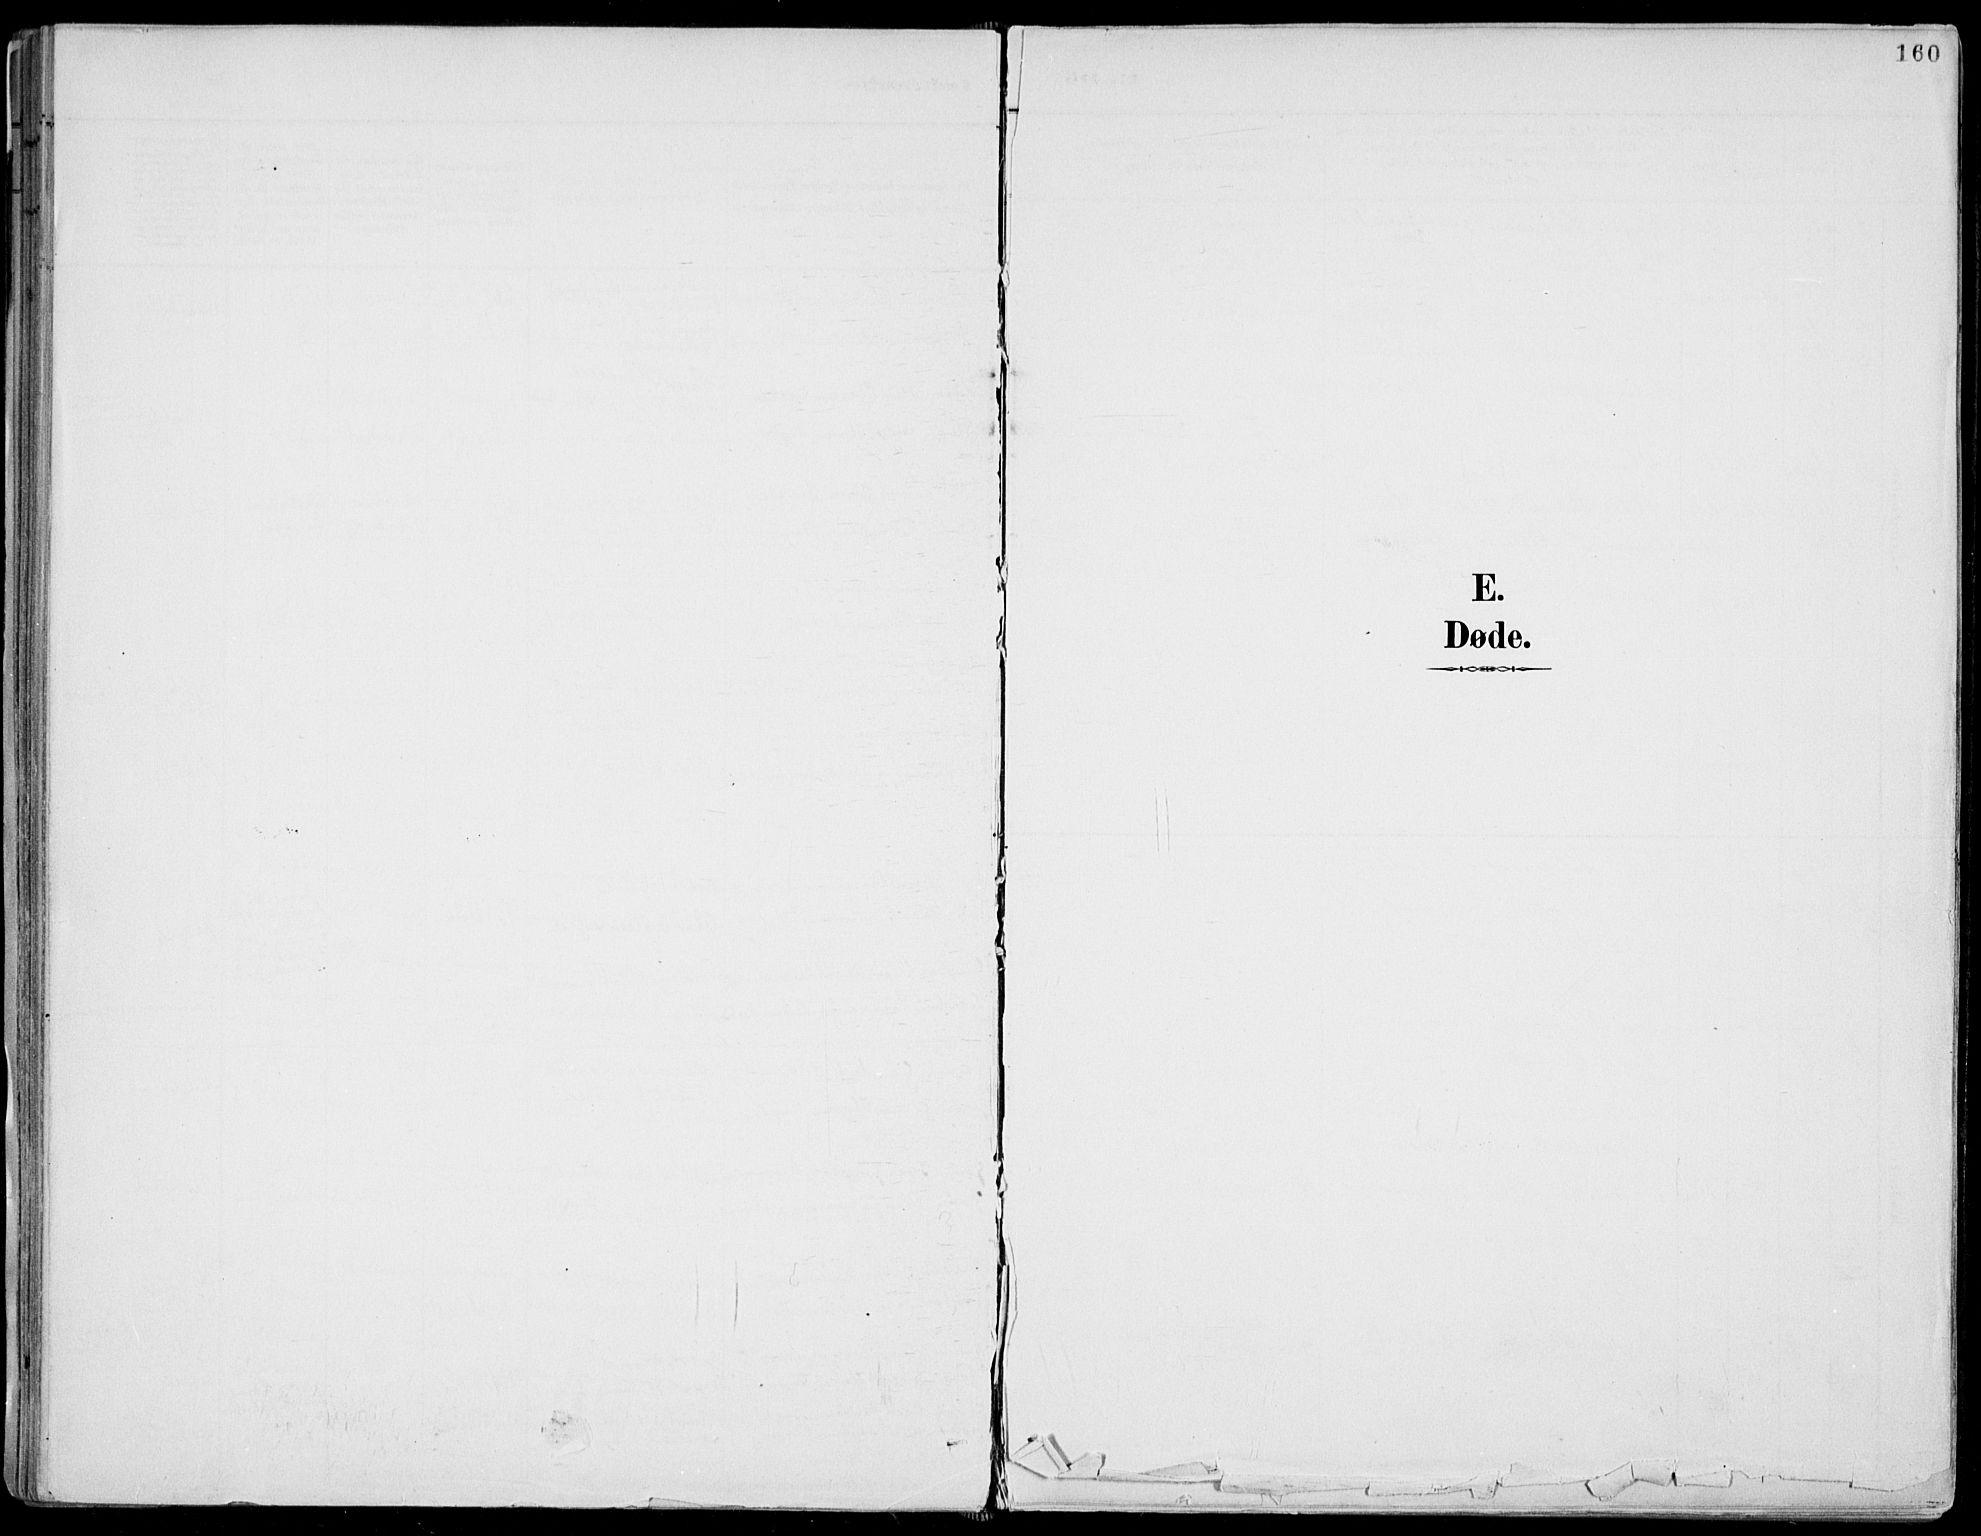 SAKO, Fyresdal kirkebøker, F/Fa/L0007: Parish register (official) no. I 7, 1887-1914, p. 160